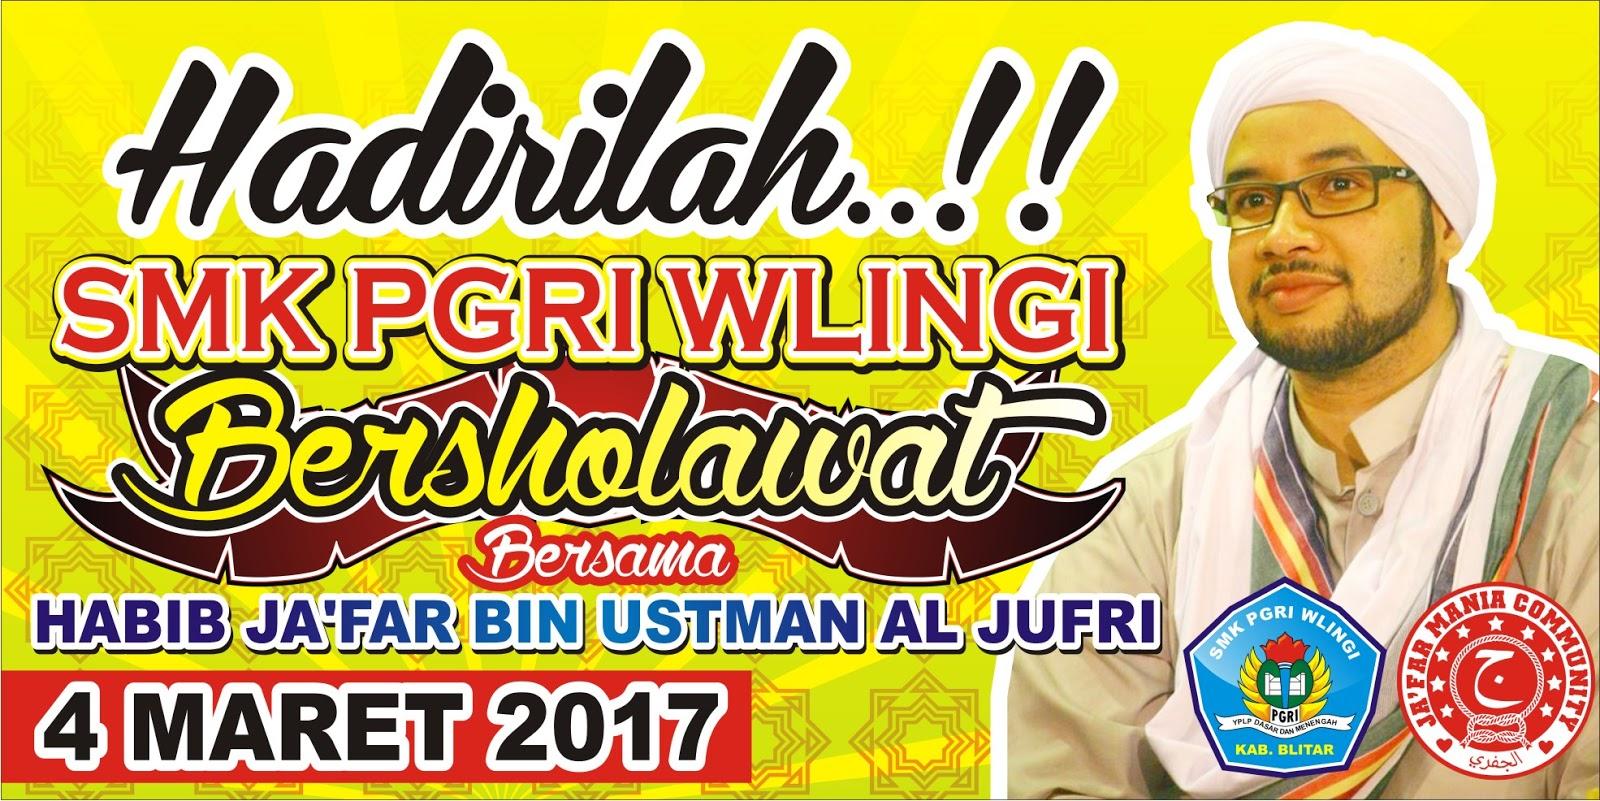 Banner Sholawat Habib Jafar Vector